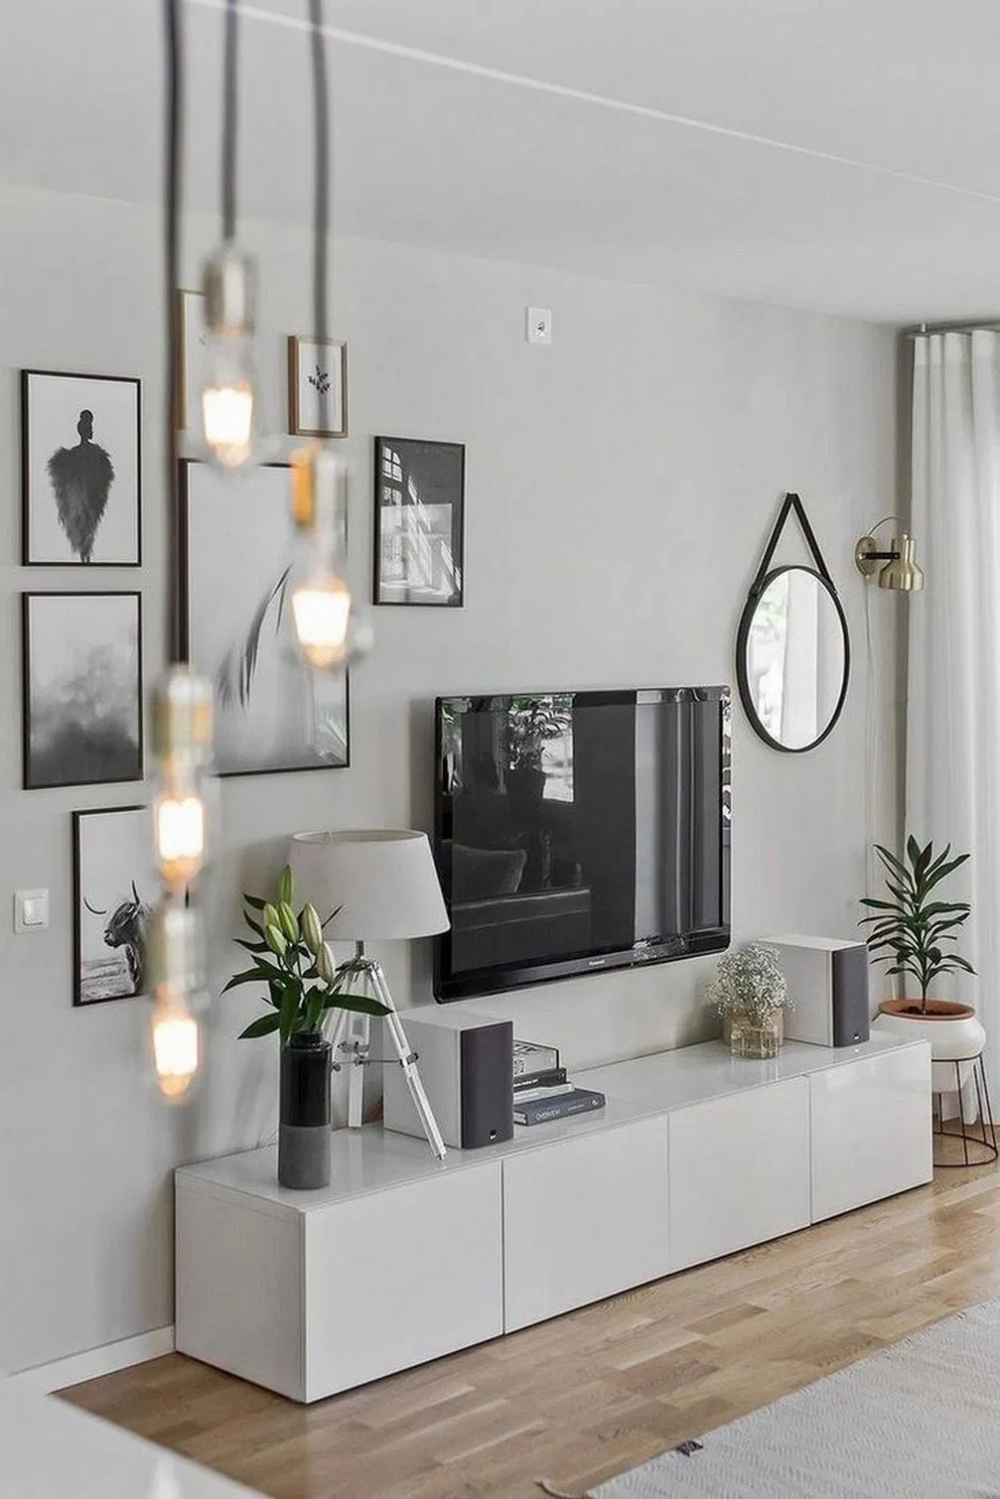 36 Perfect Textured Walls Design Ideas For Your Living Room 20 Livingroomdesign Tvstand Li Living Room Pictures Living Room Scandinavian Trendy Living Rooms #textured #wall #for #living #room